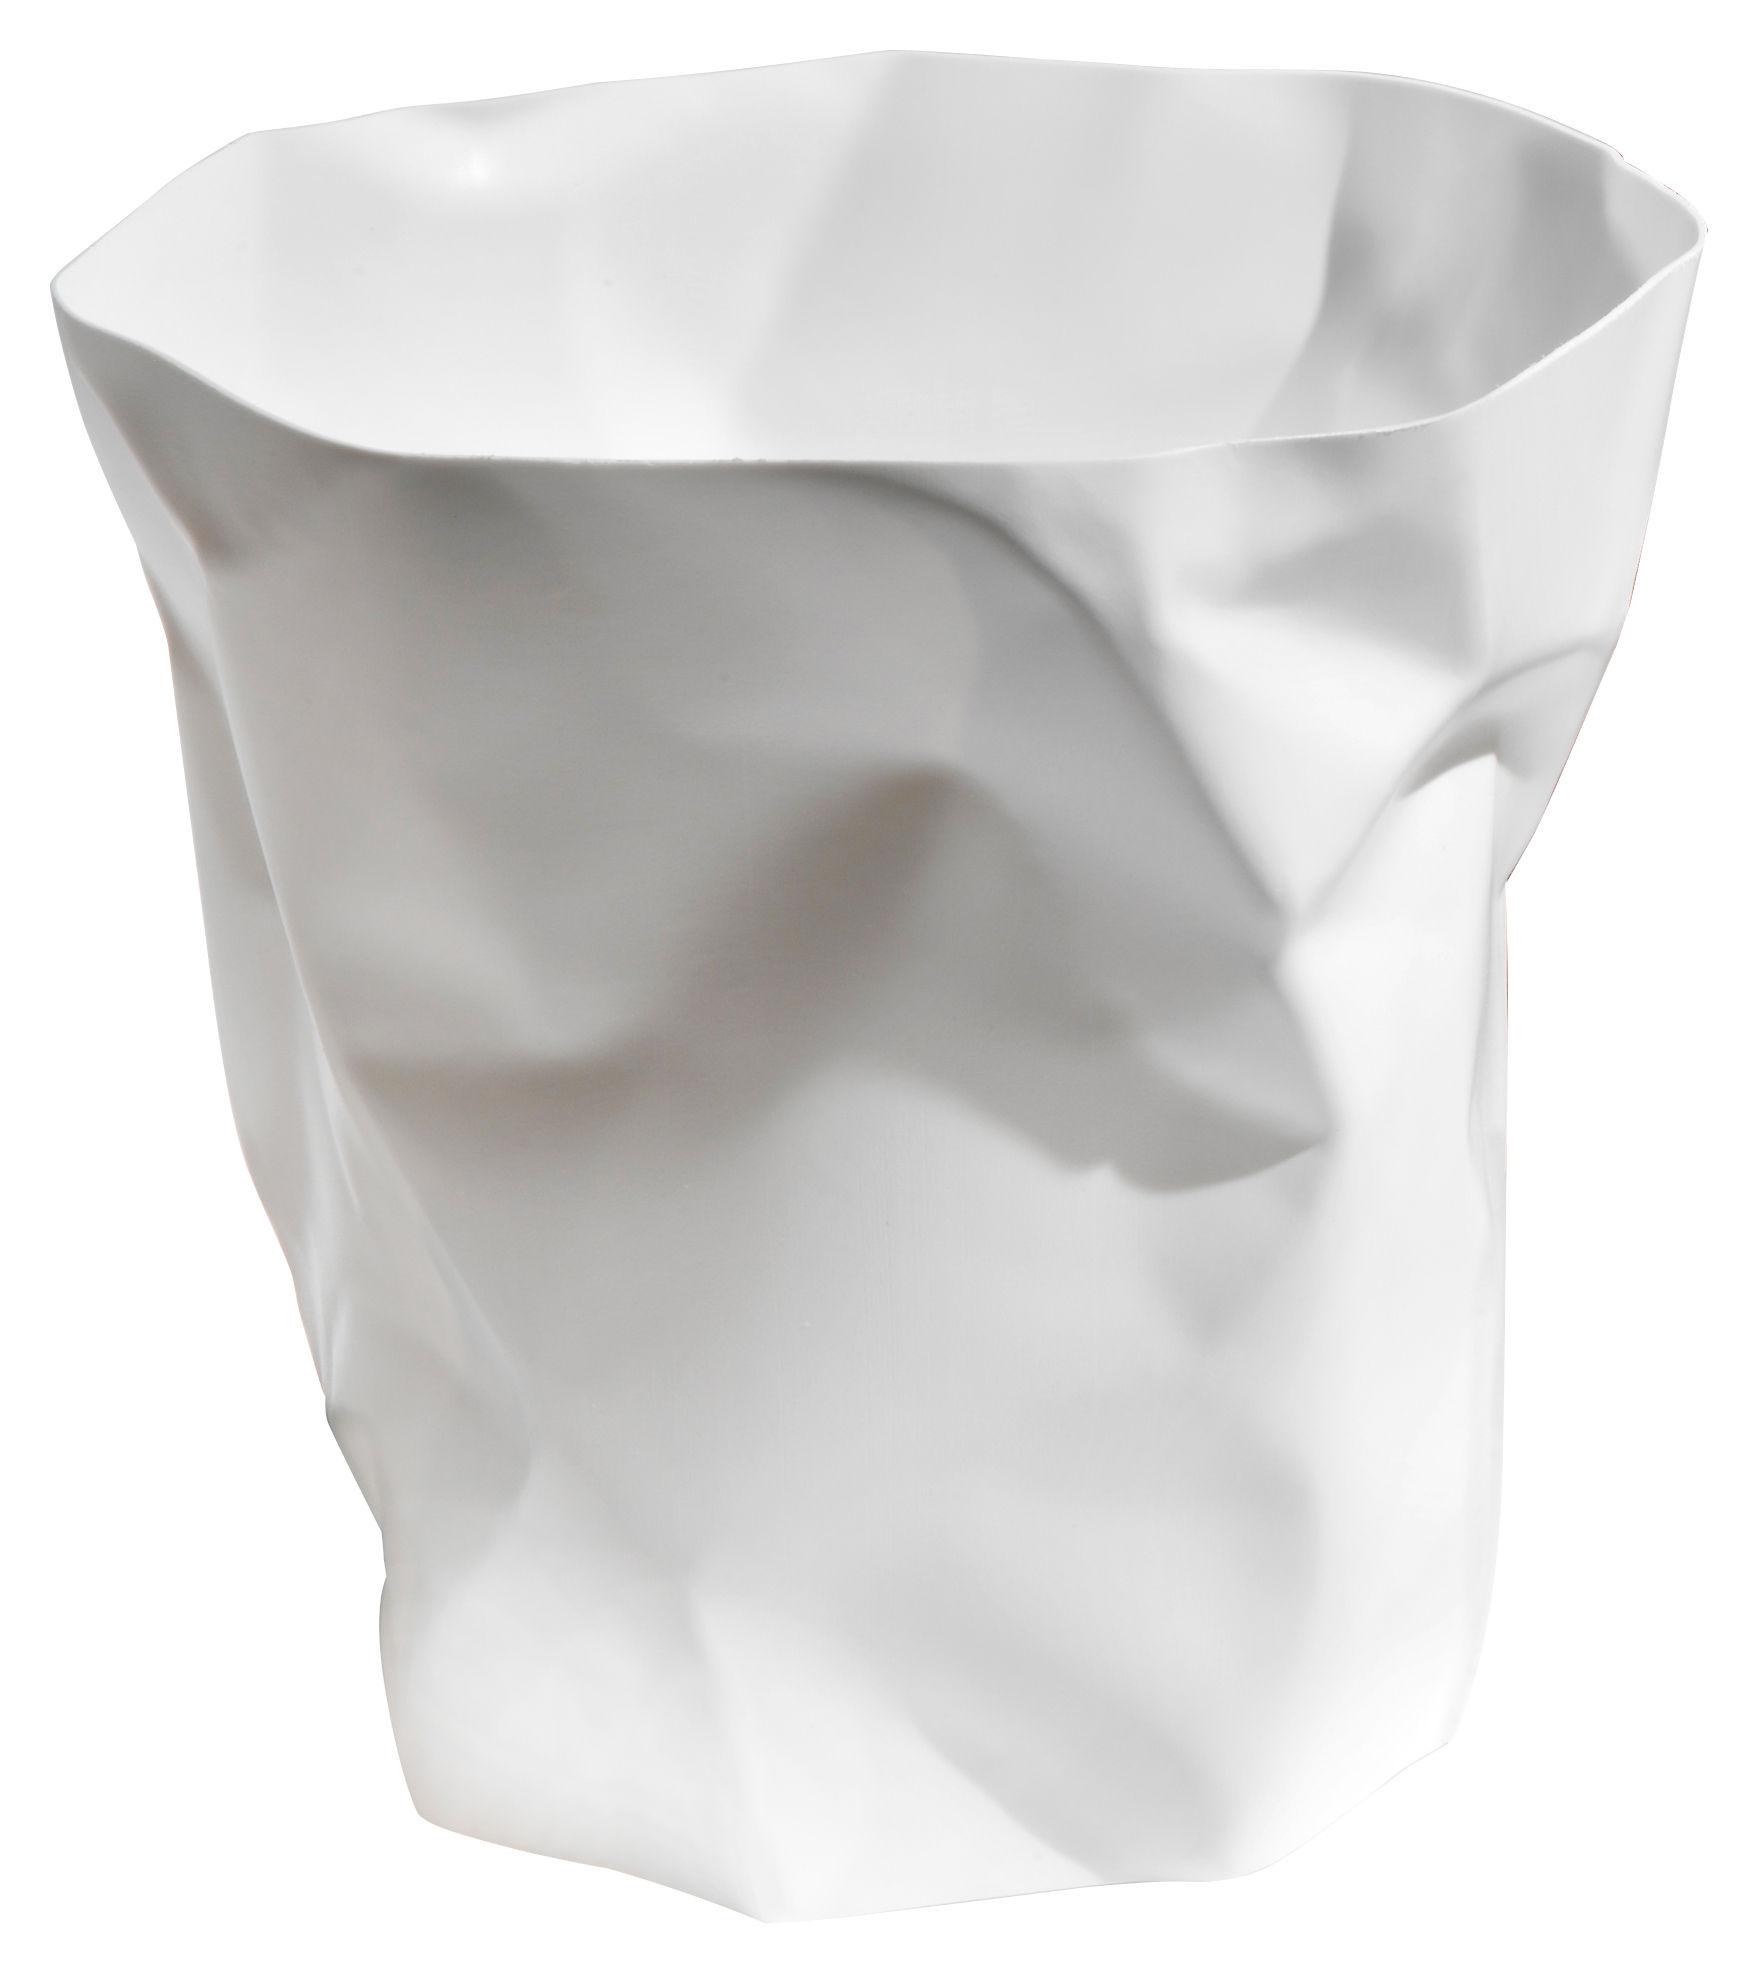 Interni - Ufficio - Cesto Bin Bin - H 31 x Ø 33 cm di Essey - Bianco - Polietilene